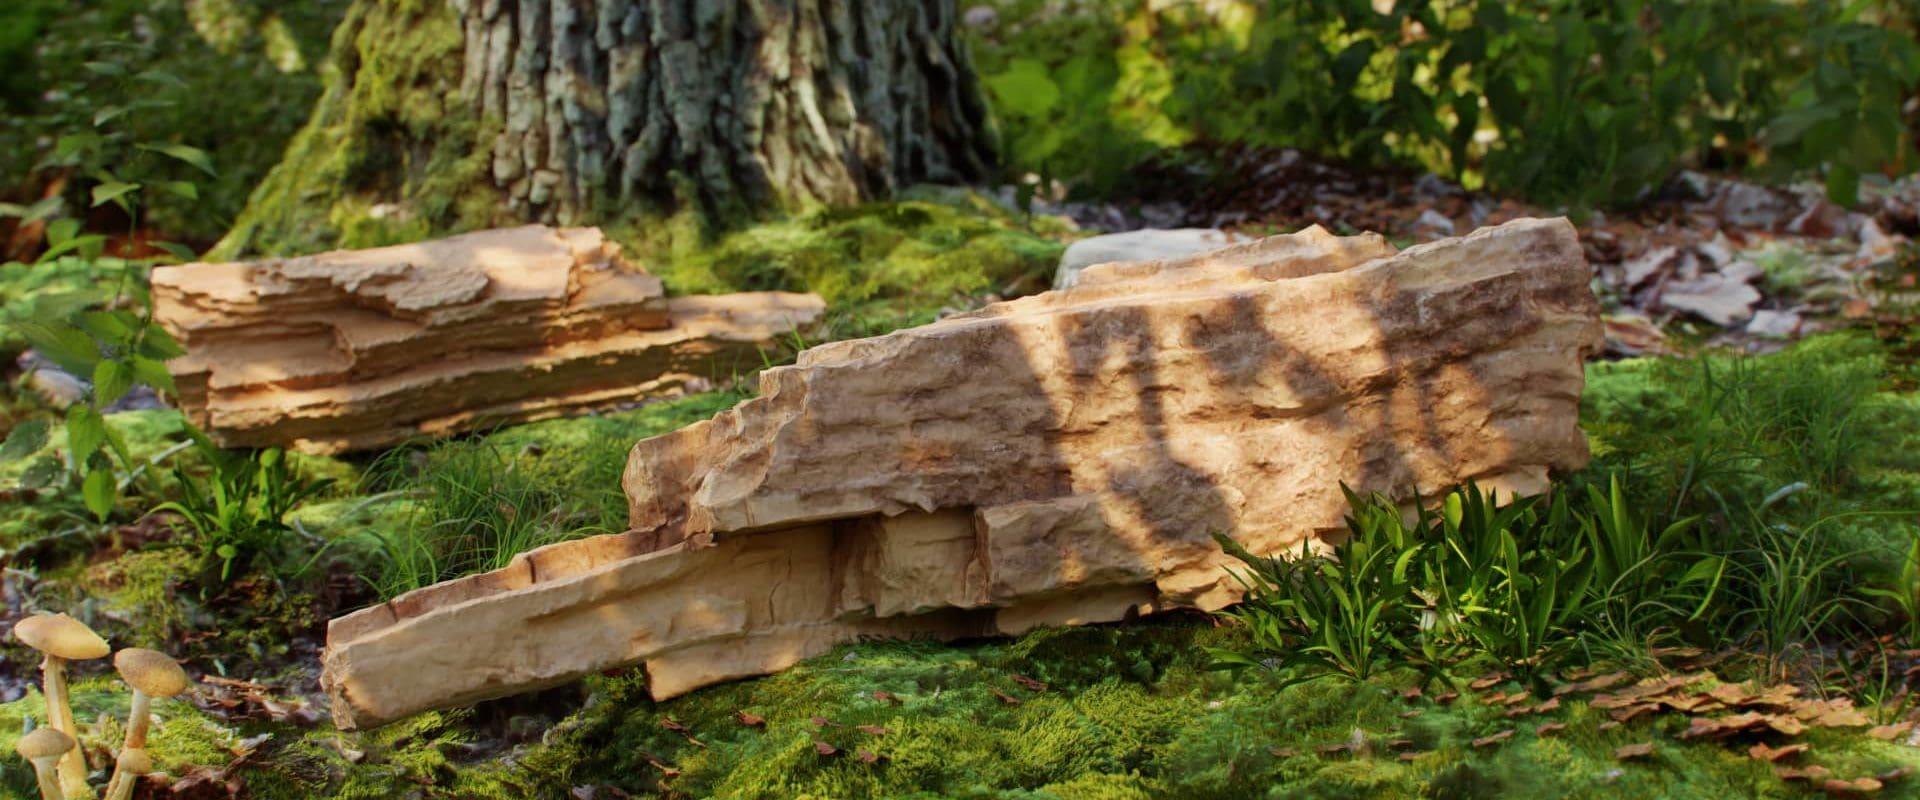 Wood_piece_360_2_8_